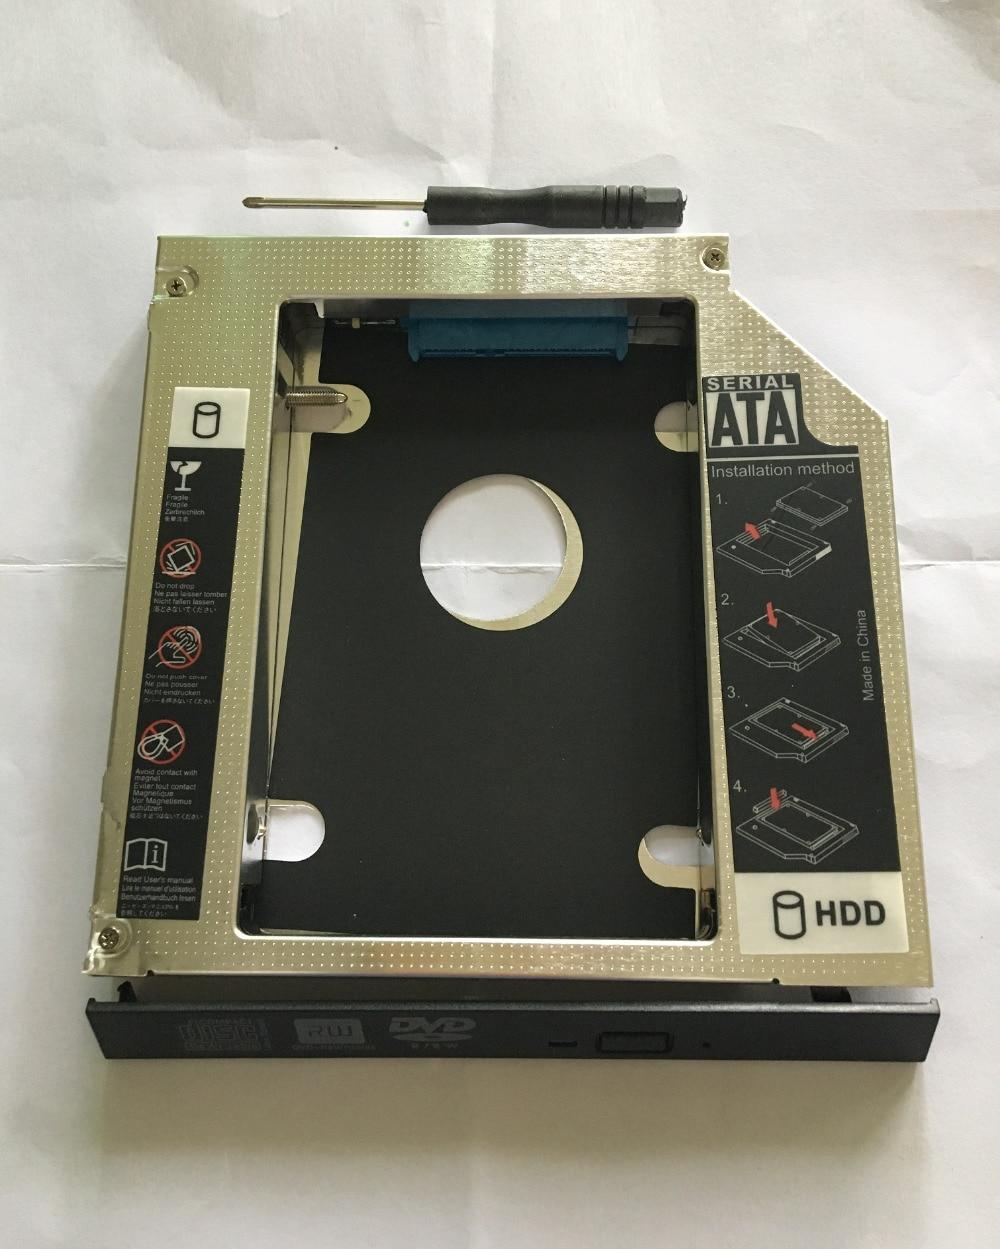 WZSM 9,5 мм SATA 2nd диск SSD жесткий диск Caddy для lenovo ideapad 110-15 ISK/ACL/ ИБР